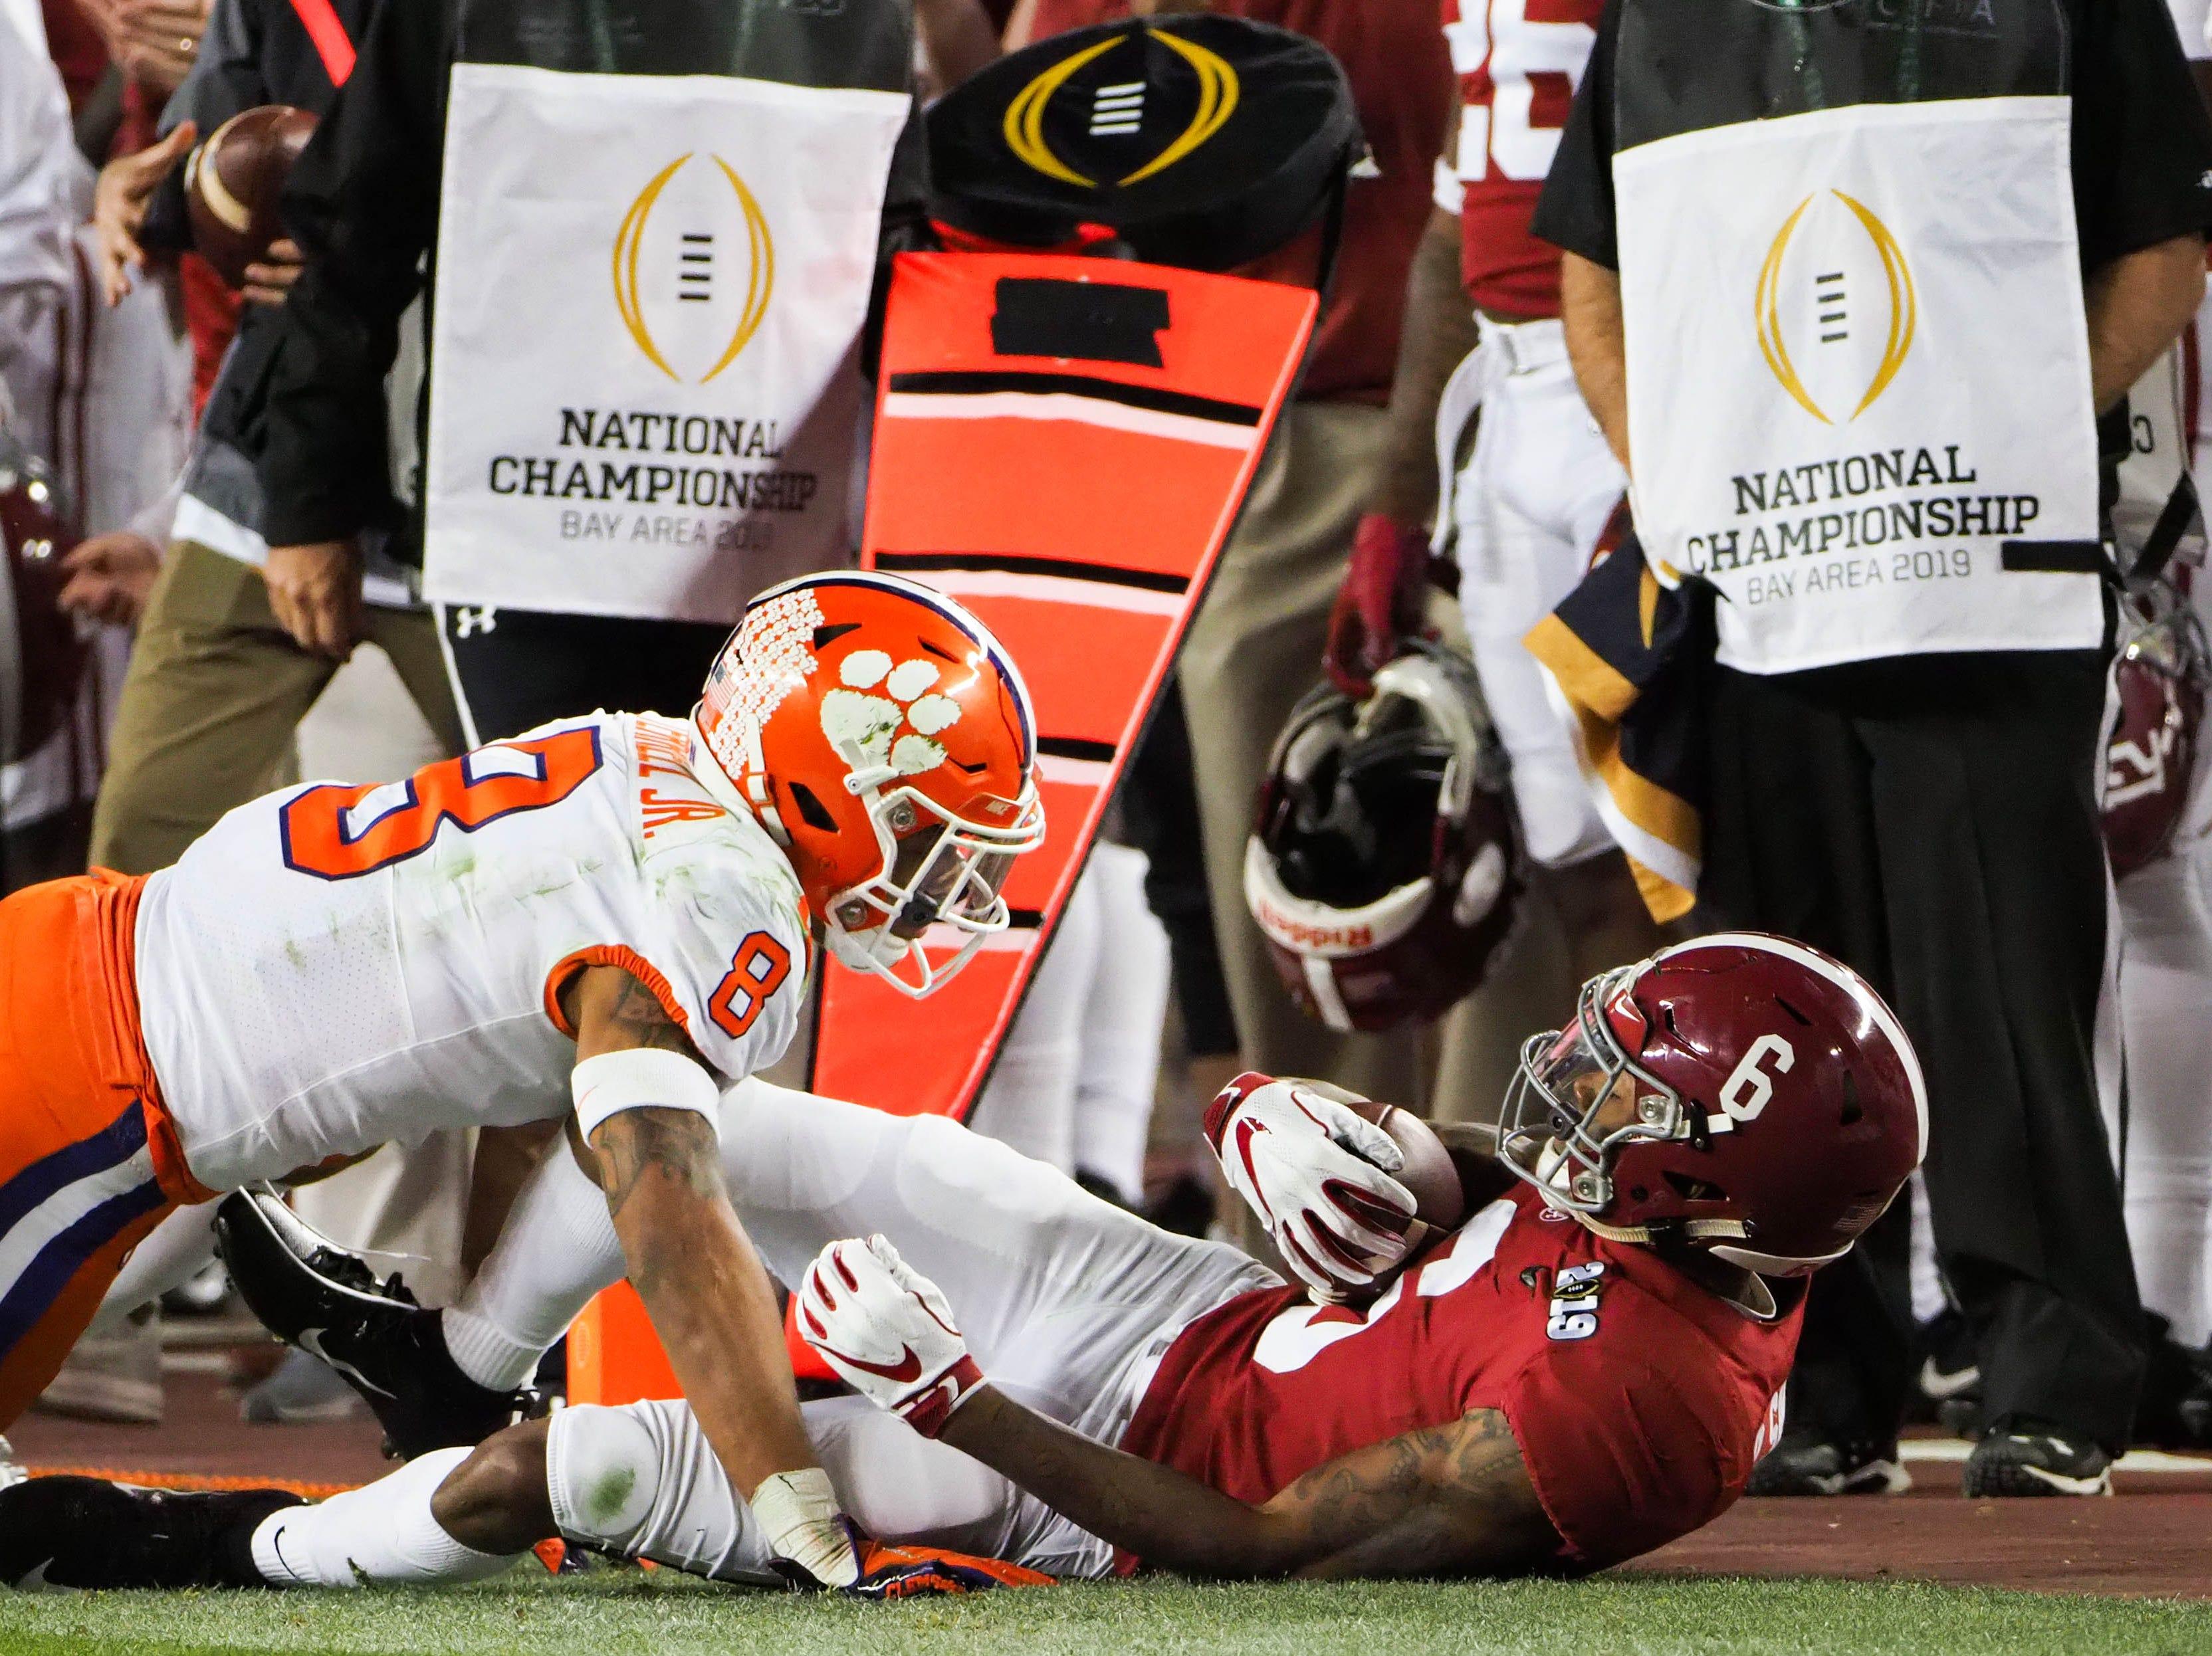 Clemson cornerback A.J. Terrell tackles Alabama's DeVonta Smith in the third quarter.